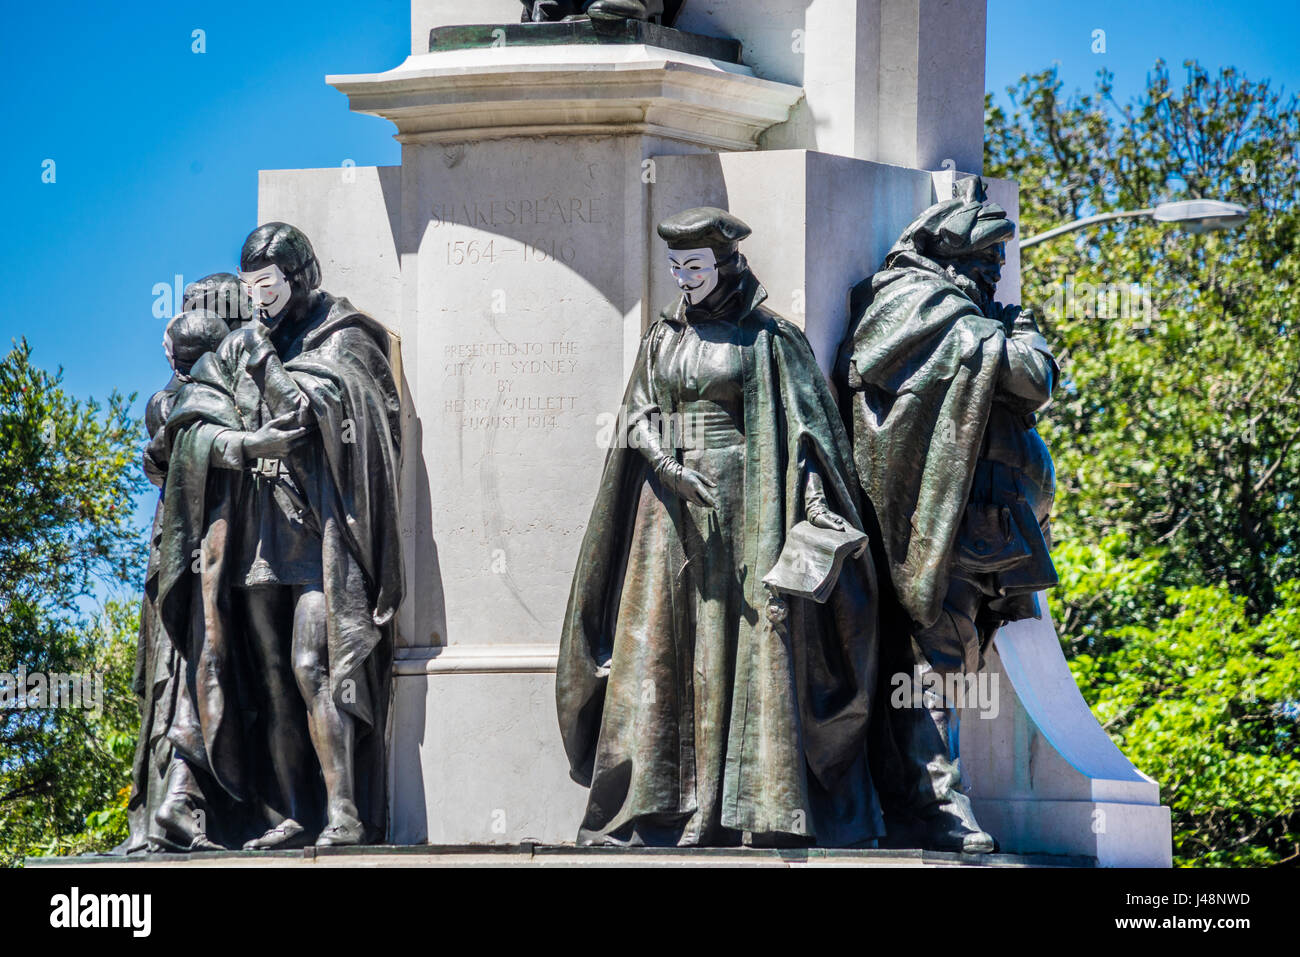 Australien, New South Wales, Sydney, Shakespeare Ort, Shakespear Zeichen der Gedenkstätte Shakespear Guy Fawkes Stockbild